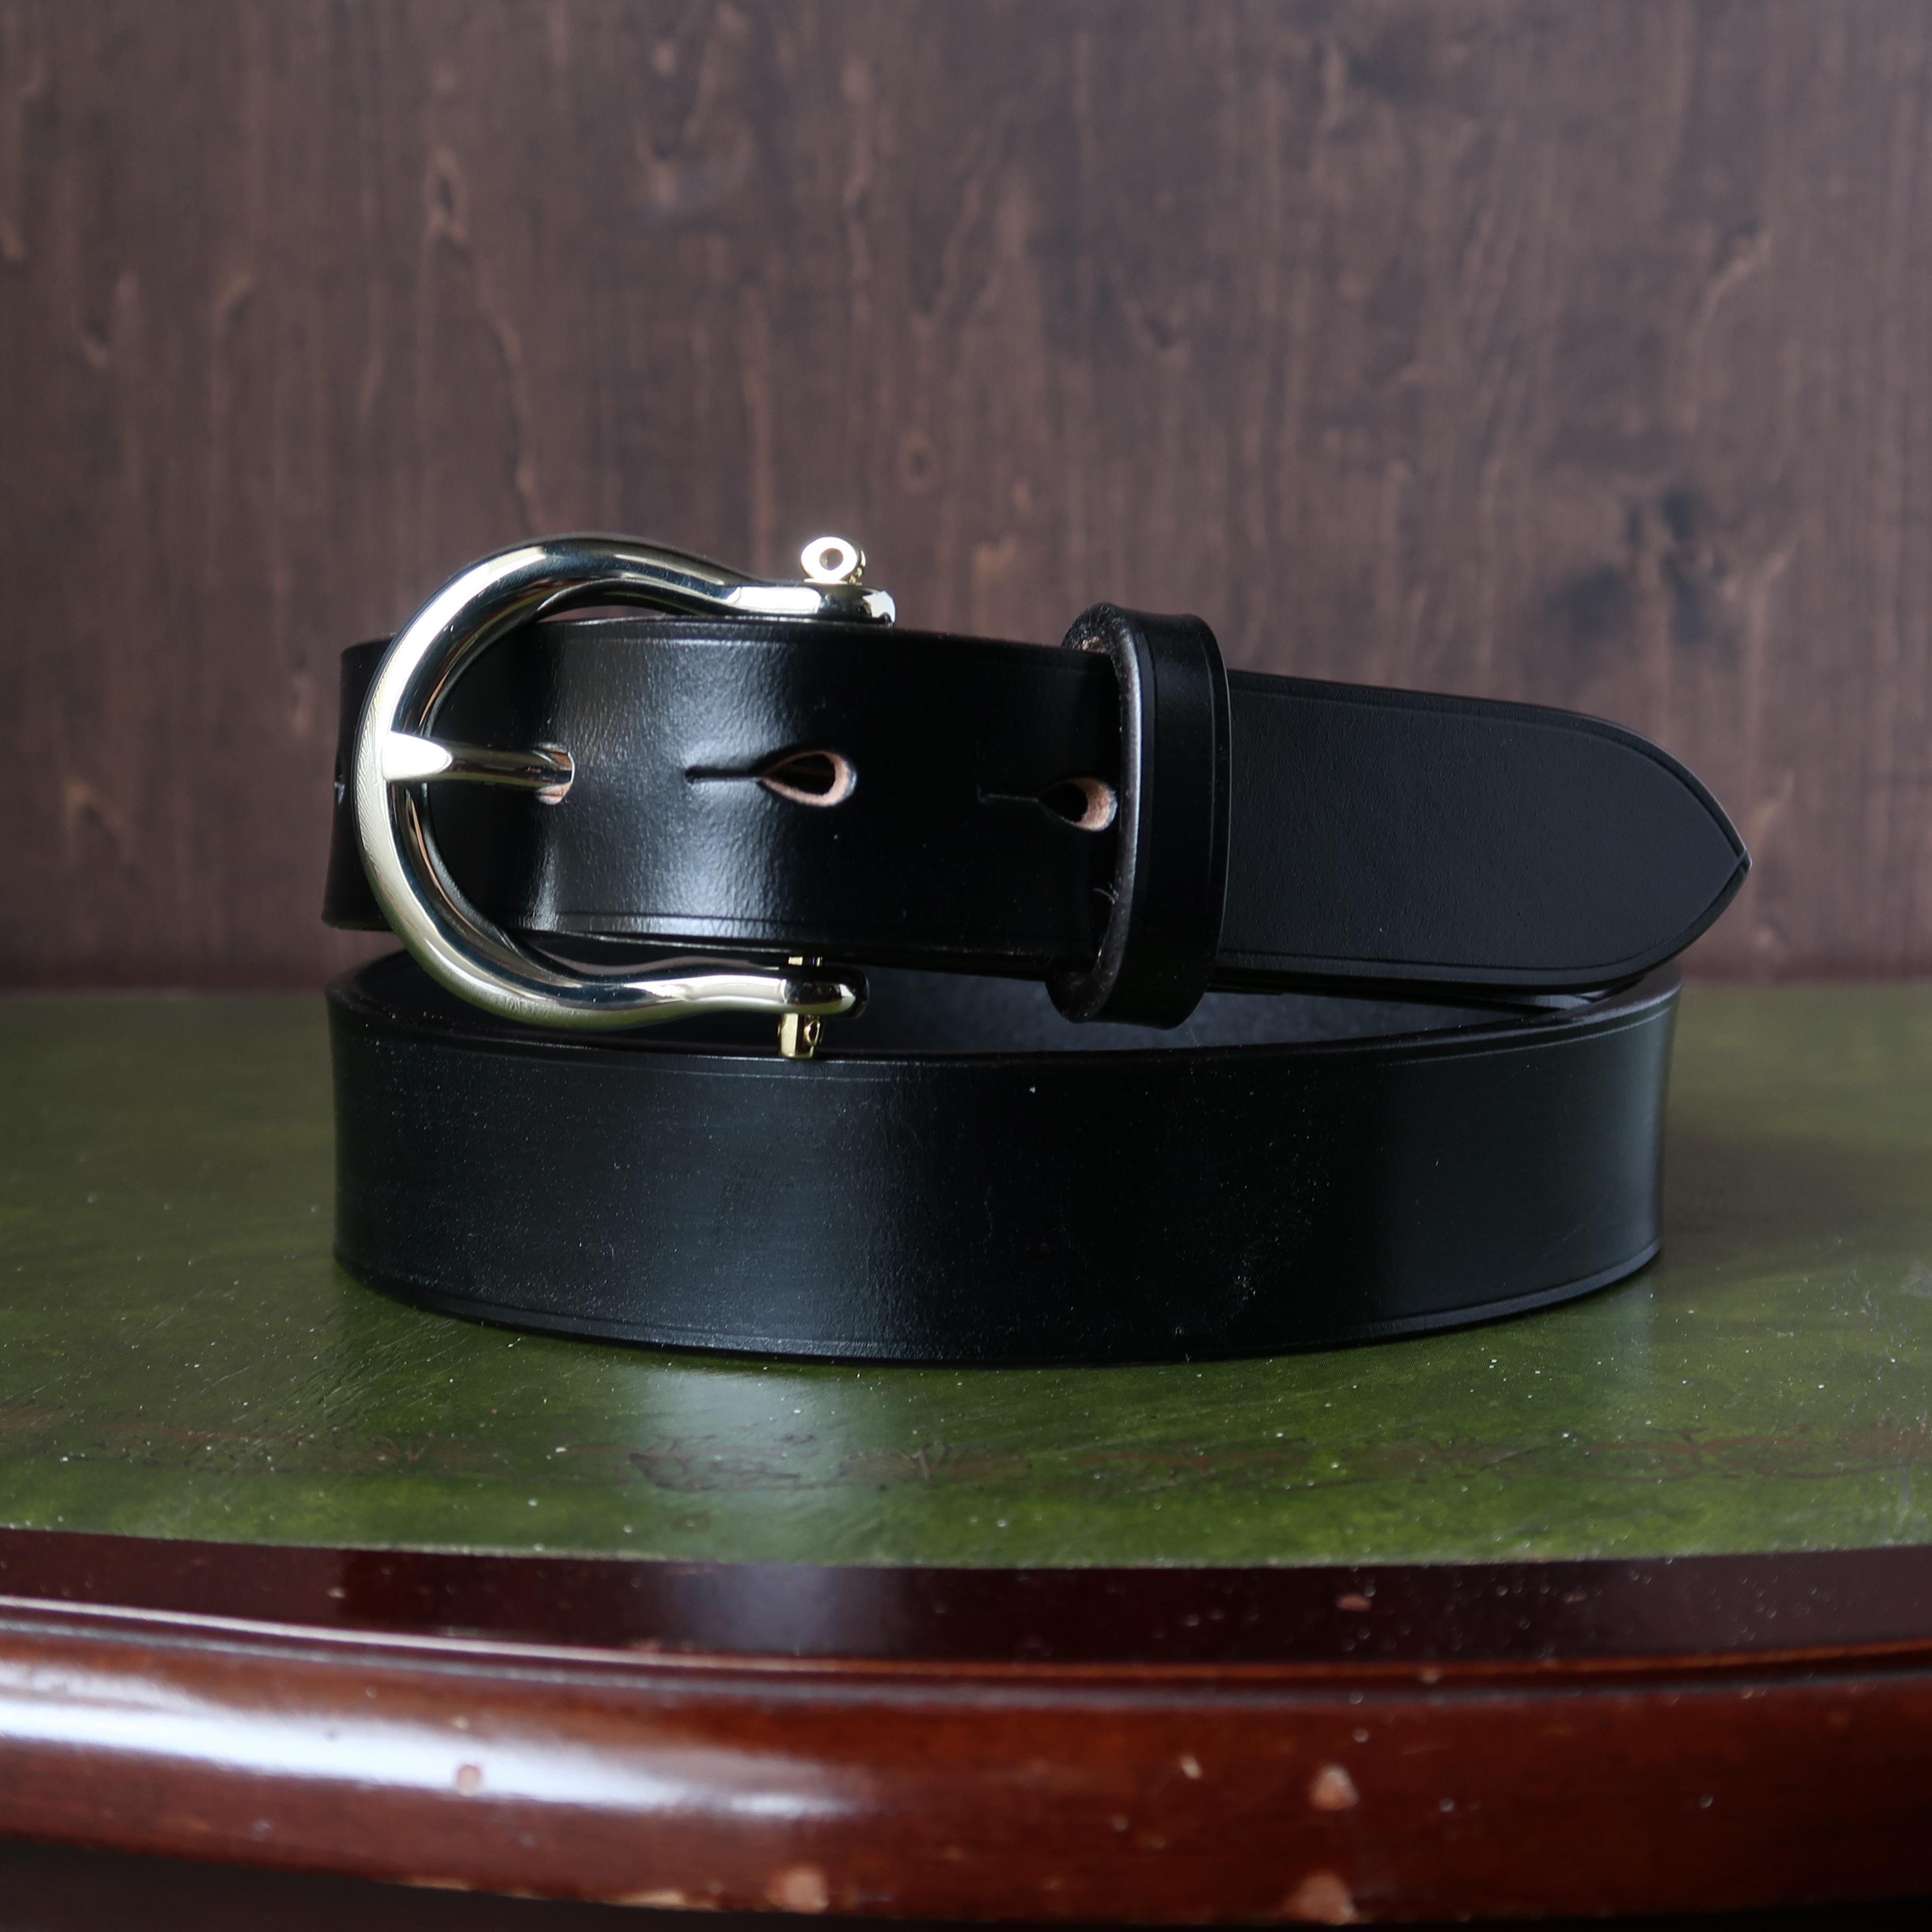 SHACKLE BUCKLE BELT シャックルバックルベルト UKブライドルレザー一枚革ベルト